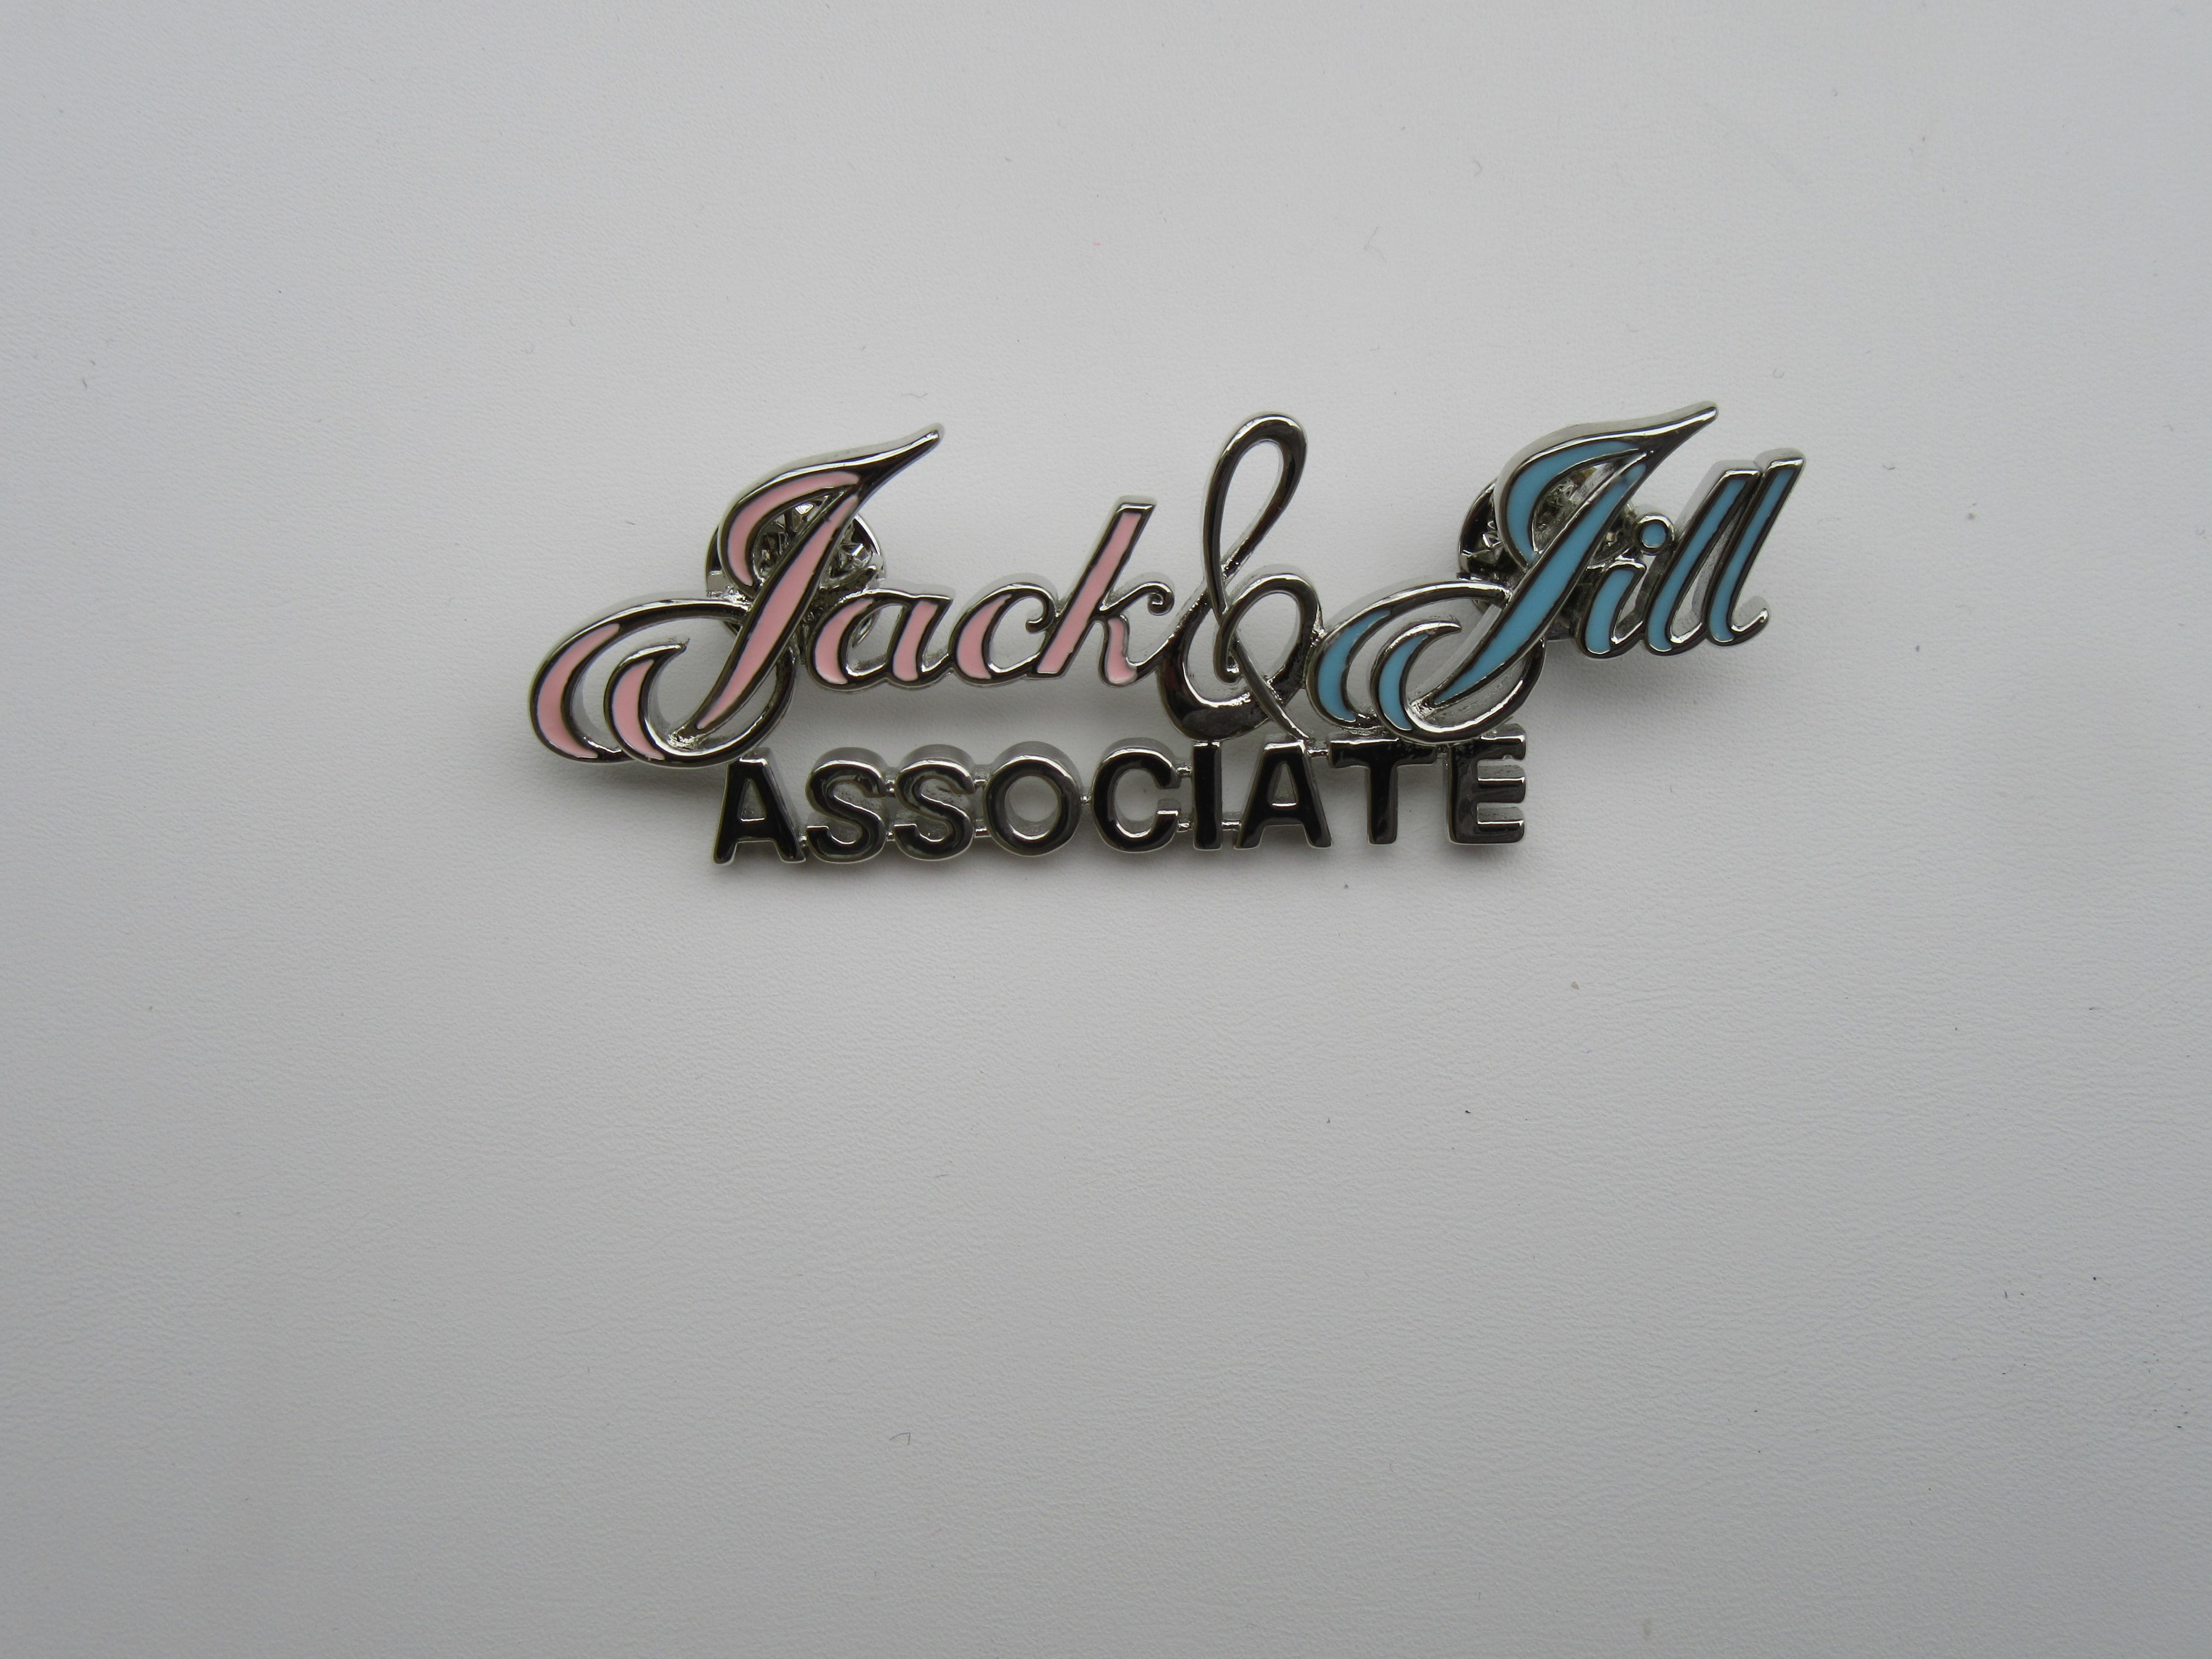 New ! Jack & Jill Associate Pin 00081